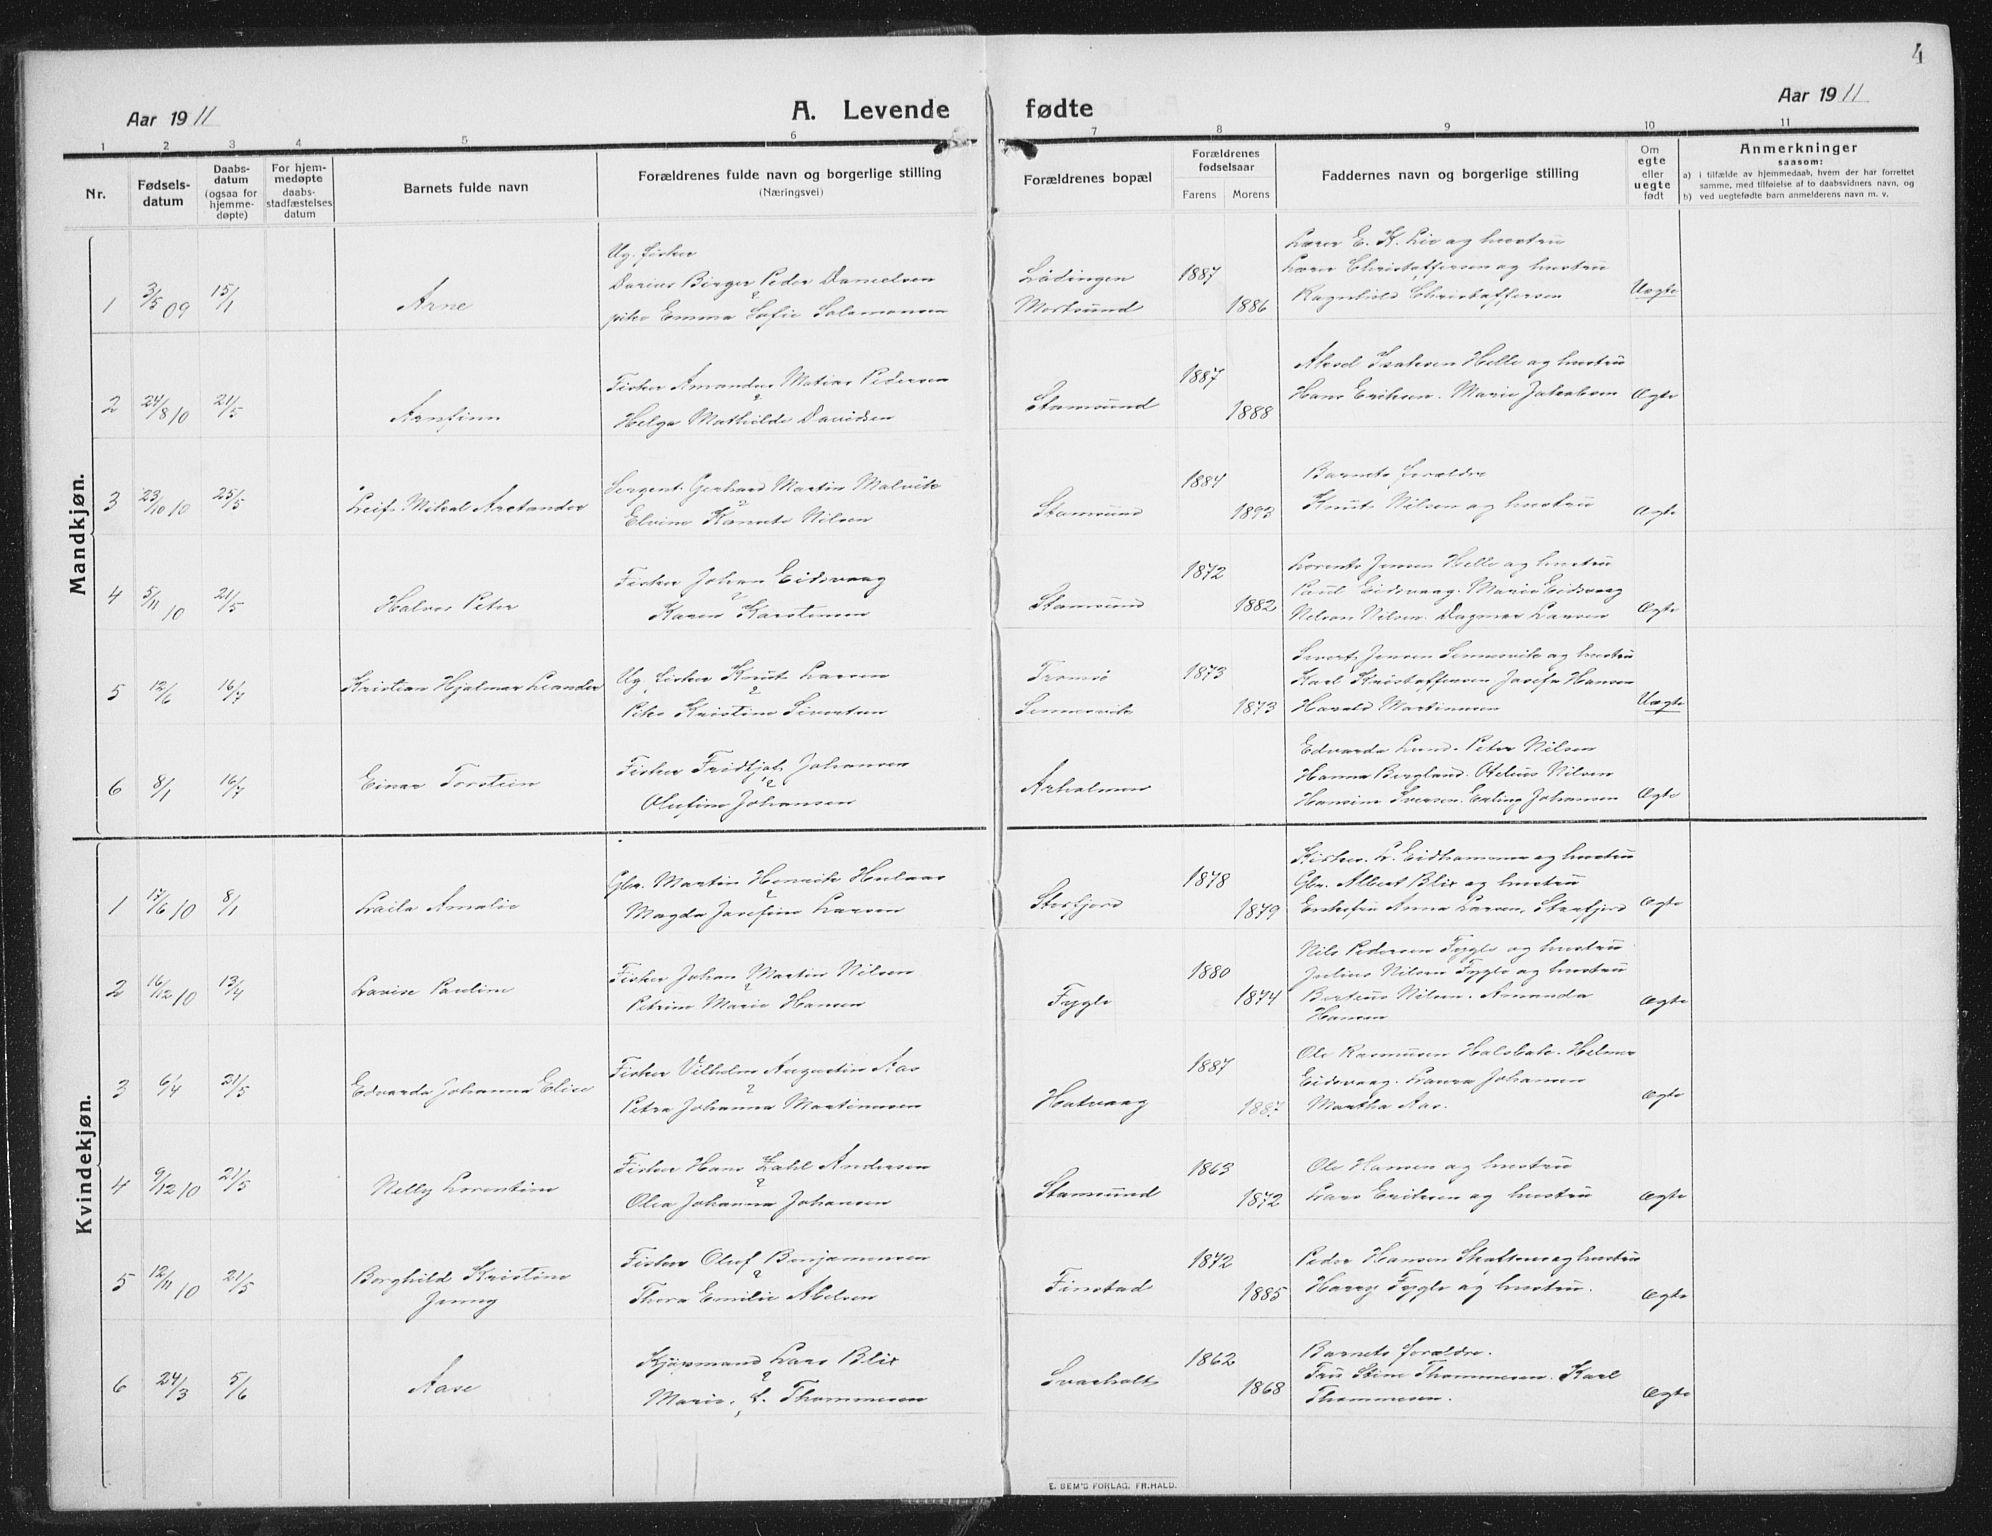 SAT, Ministerialprotokoller, klokkerbøker og fødselsregistre - Nordland, 882/L1183: Klokkerbok nr. 882C01, 1911-1938, s. 4